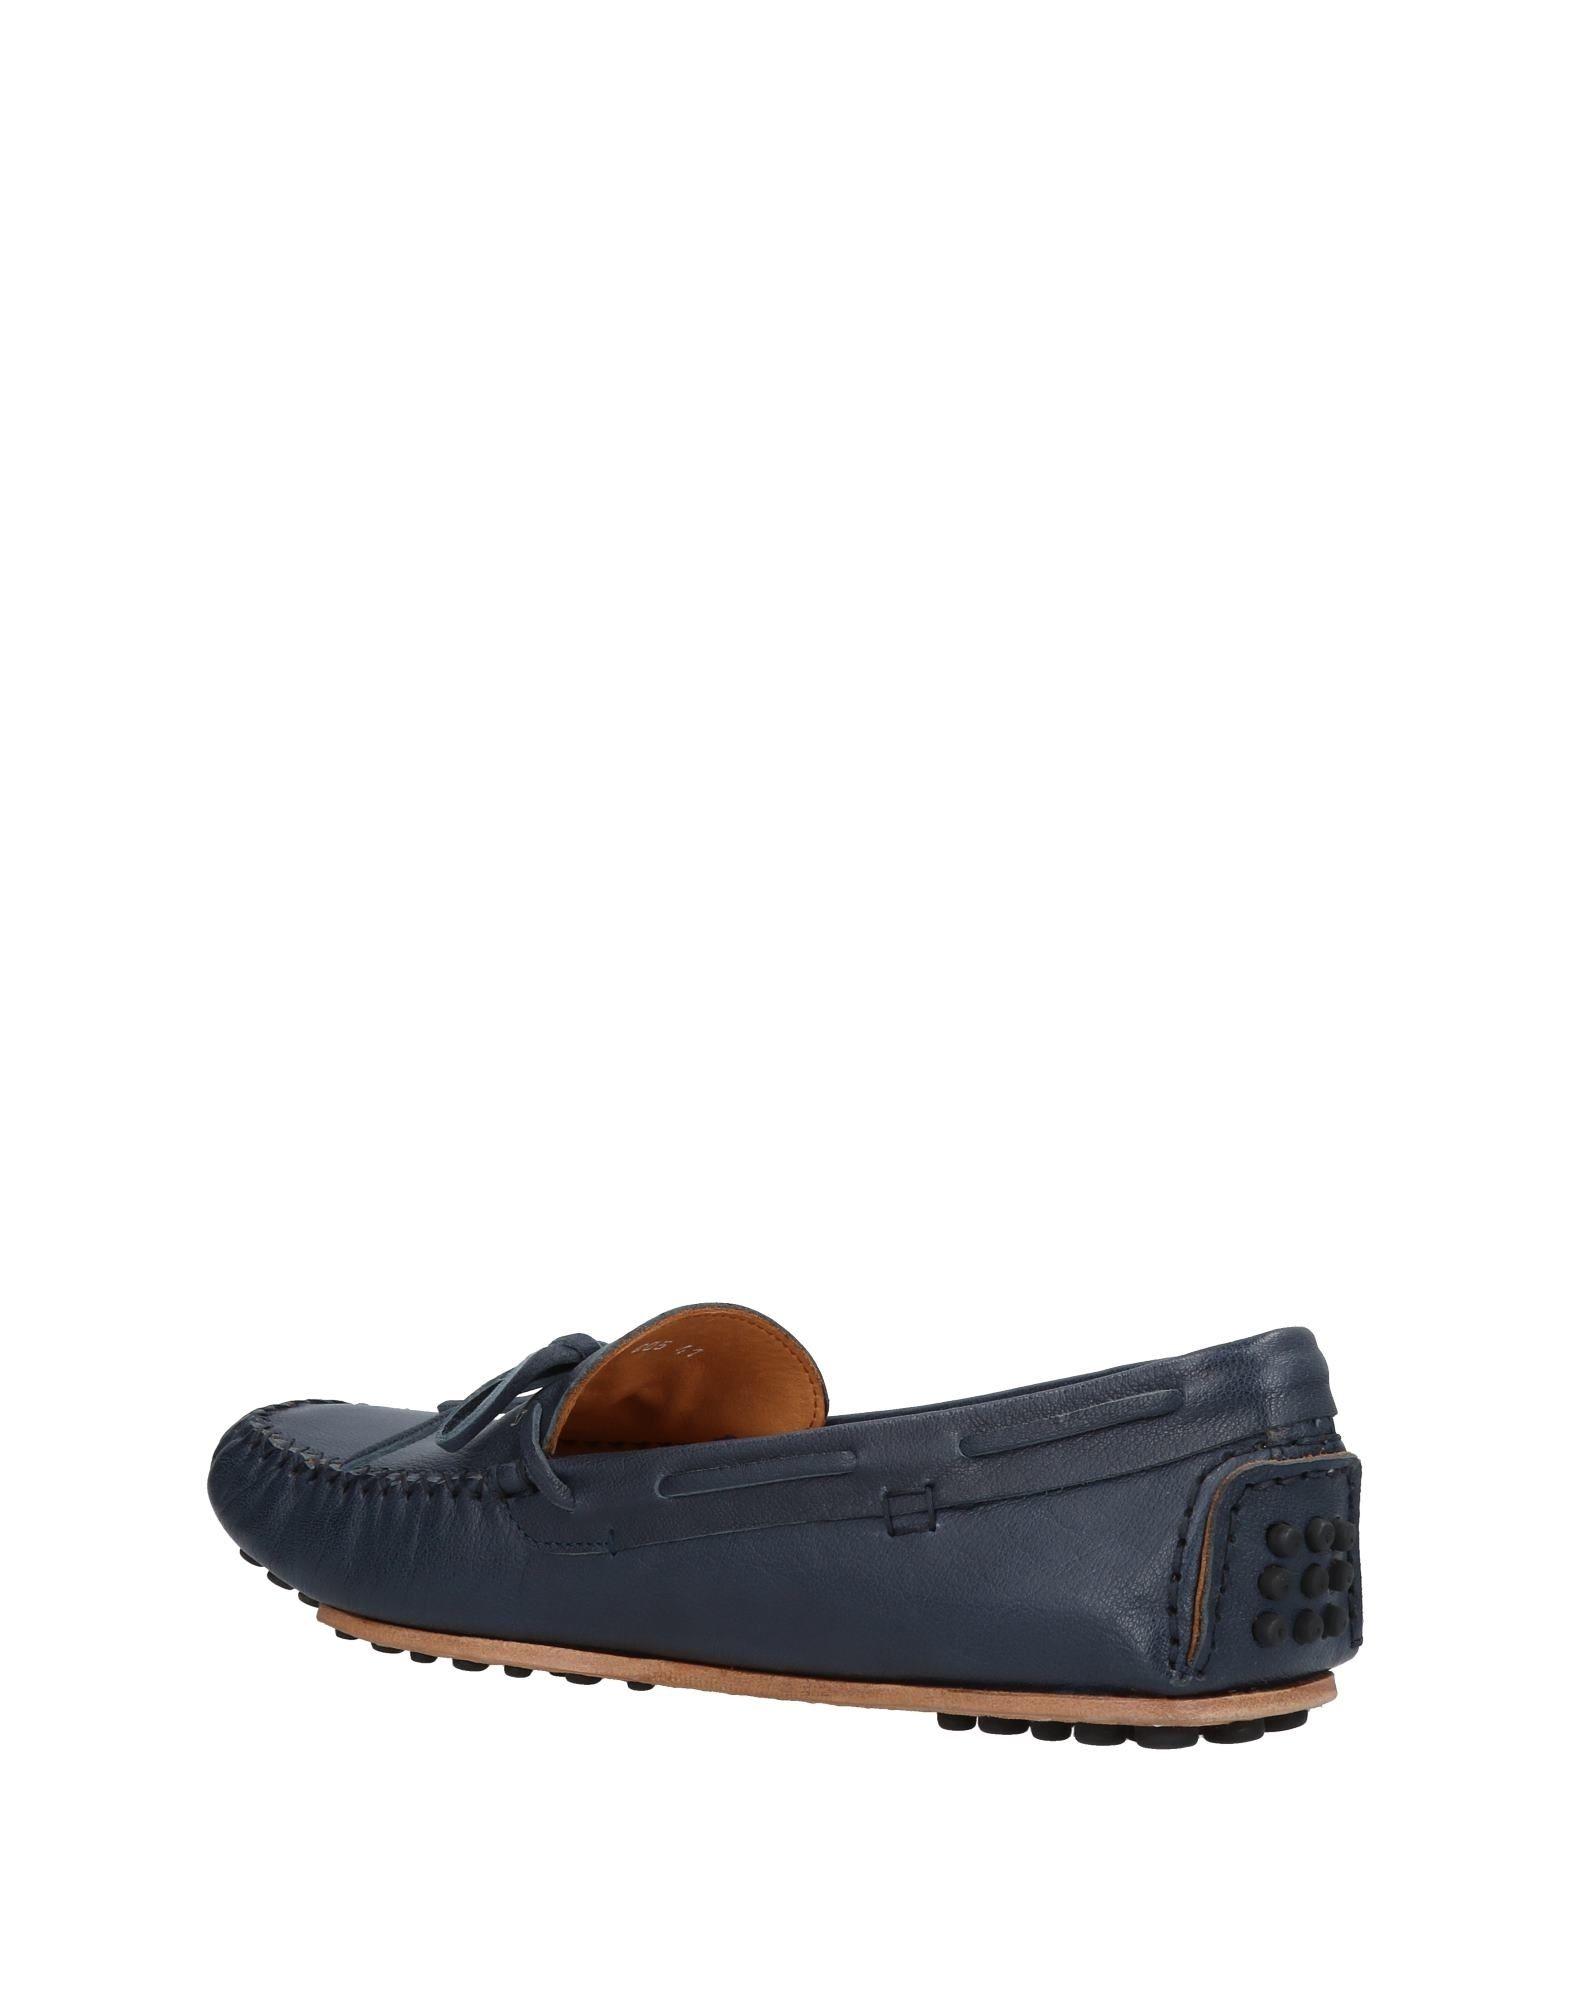 Officine Creative Italia Gute Mokassins Herren  11445468QB Gute Italia Qualität beliebte Schuhe 7c1a58